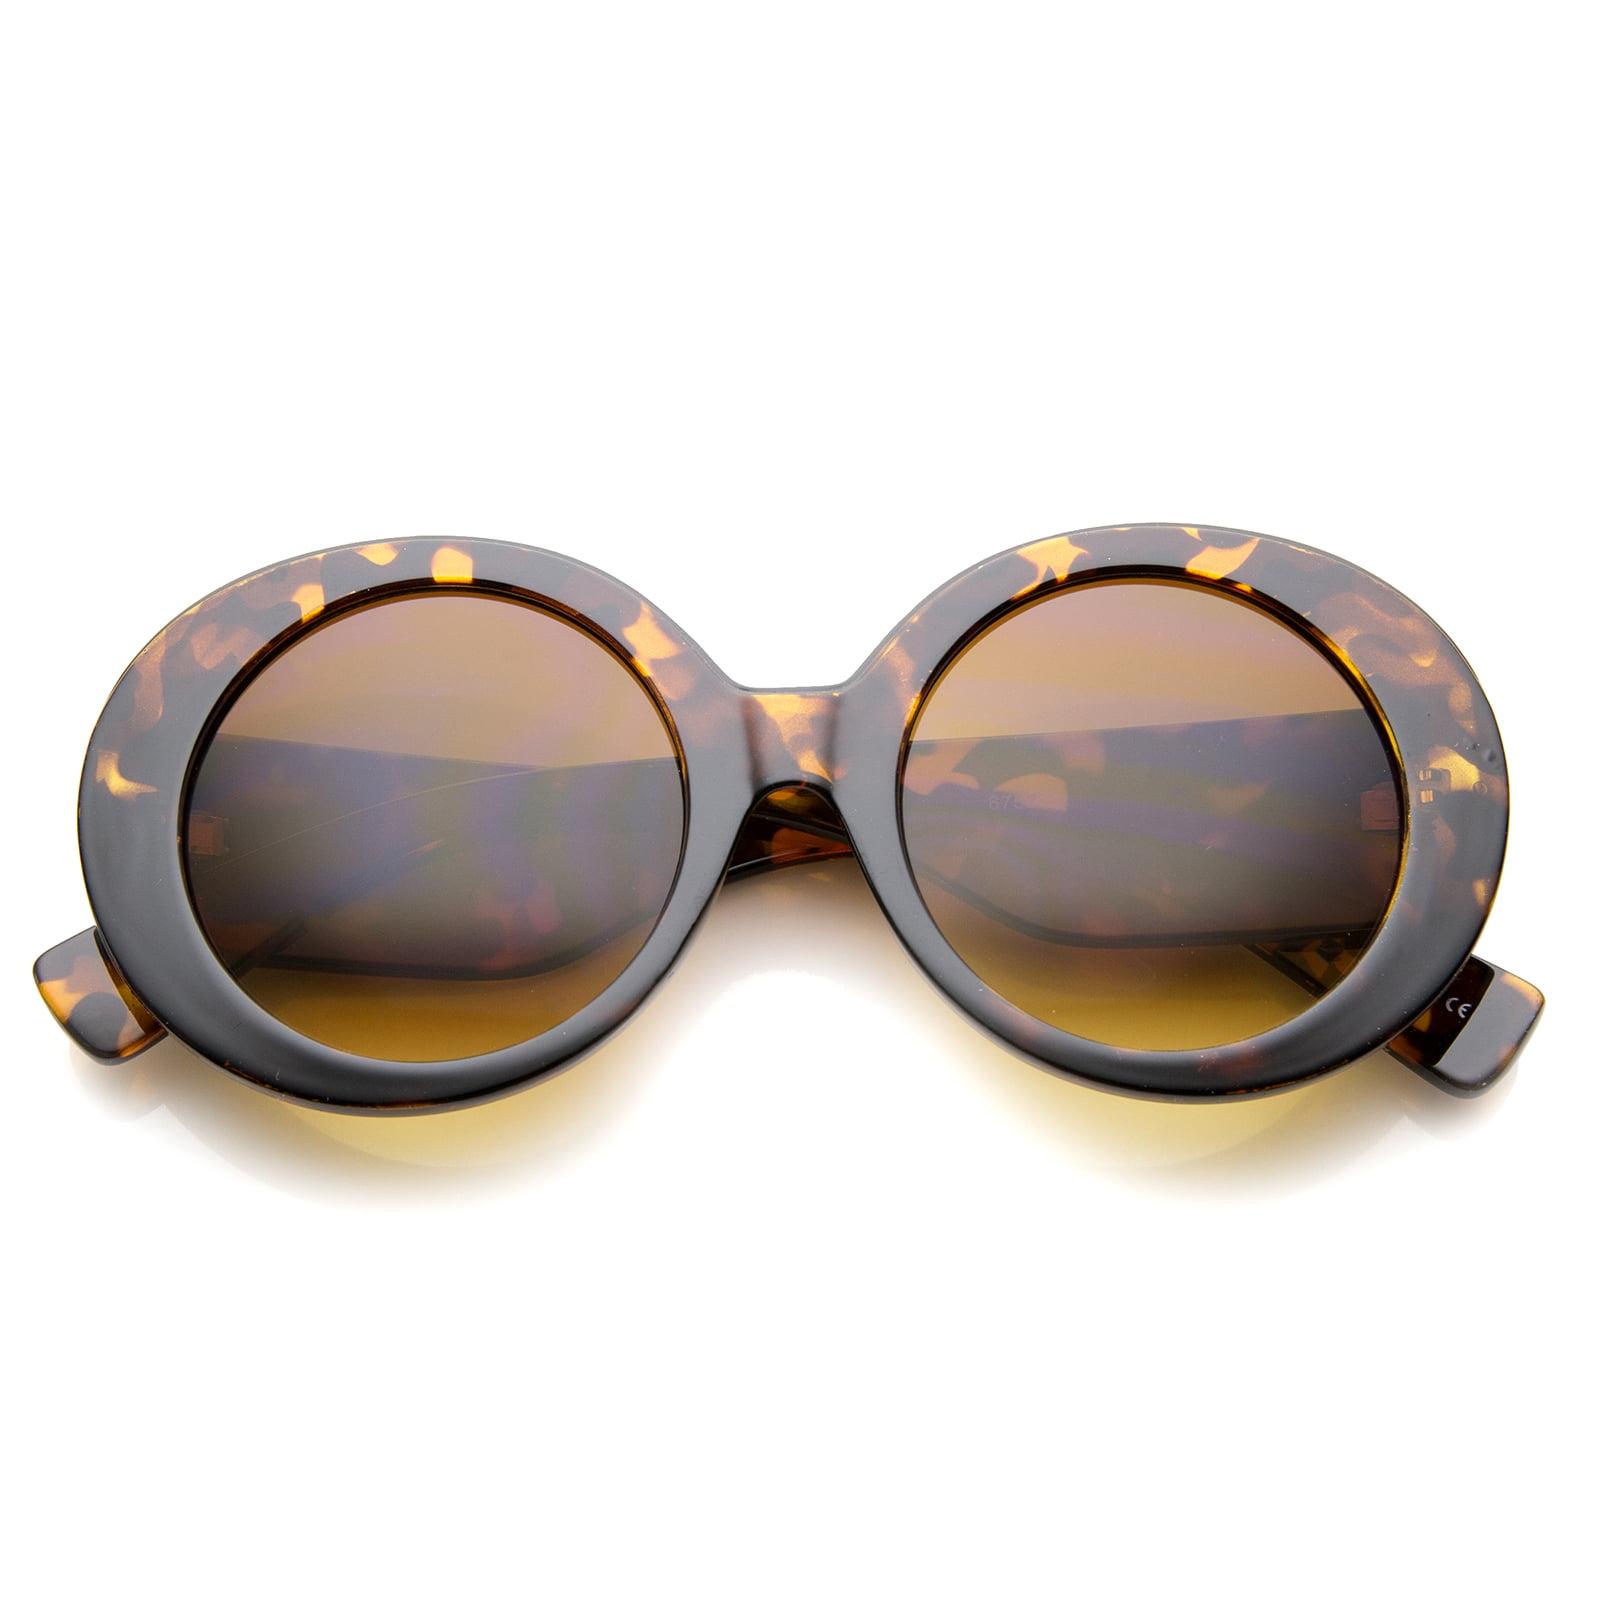 sunglassLA - Womens High Fashion Glam Chunky Round Oversize Sunglasses - 50mm